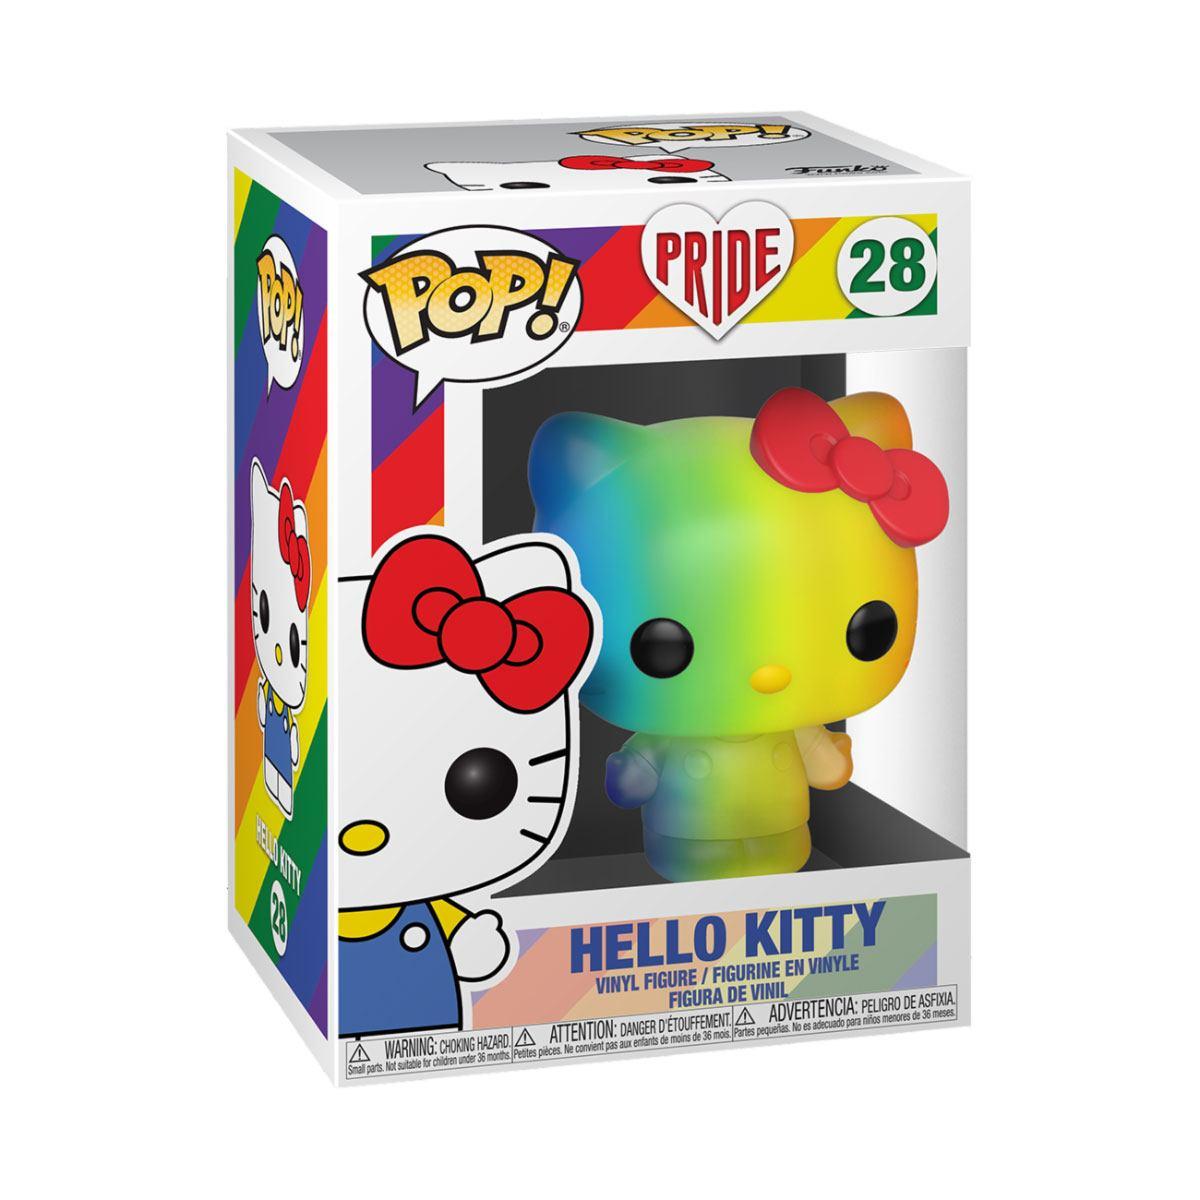 Photo du produit PRIDE 2020 HELLO KITTY POP! SANRIO VINYL FIGURINE HELLO KITTY (RNBW)